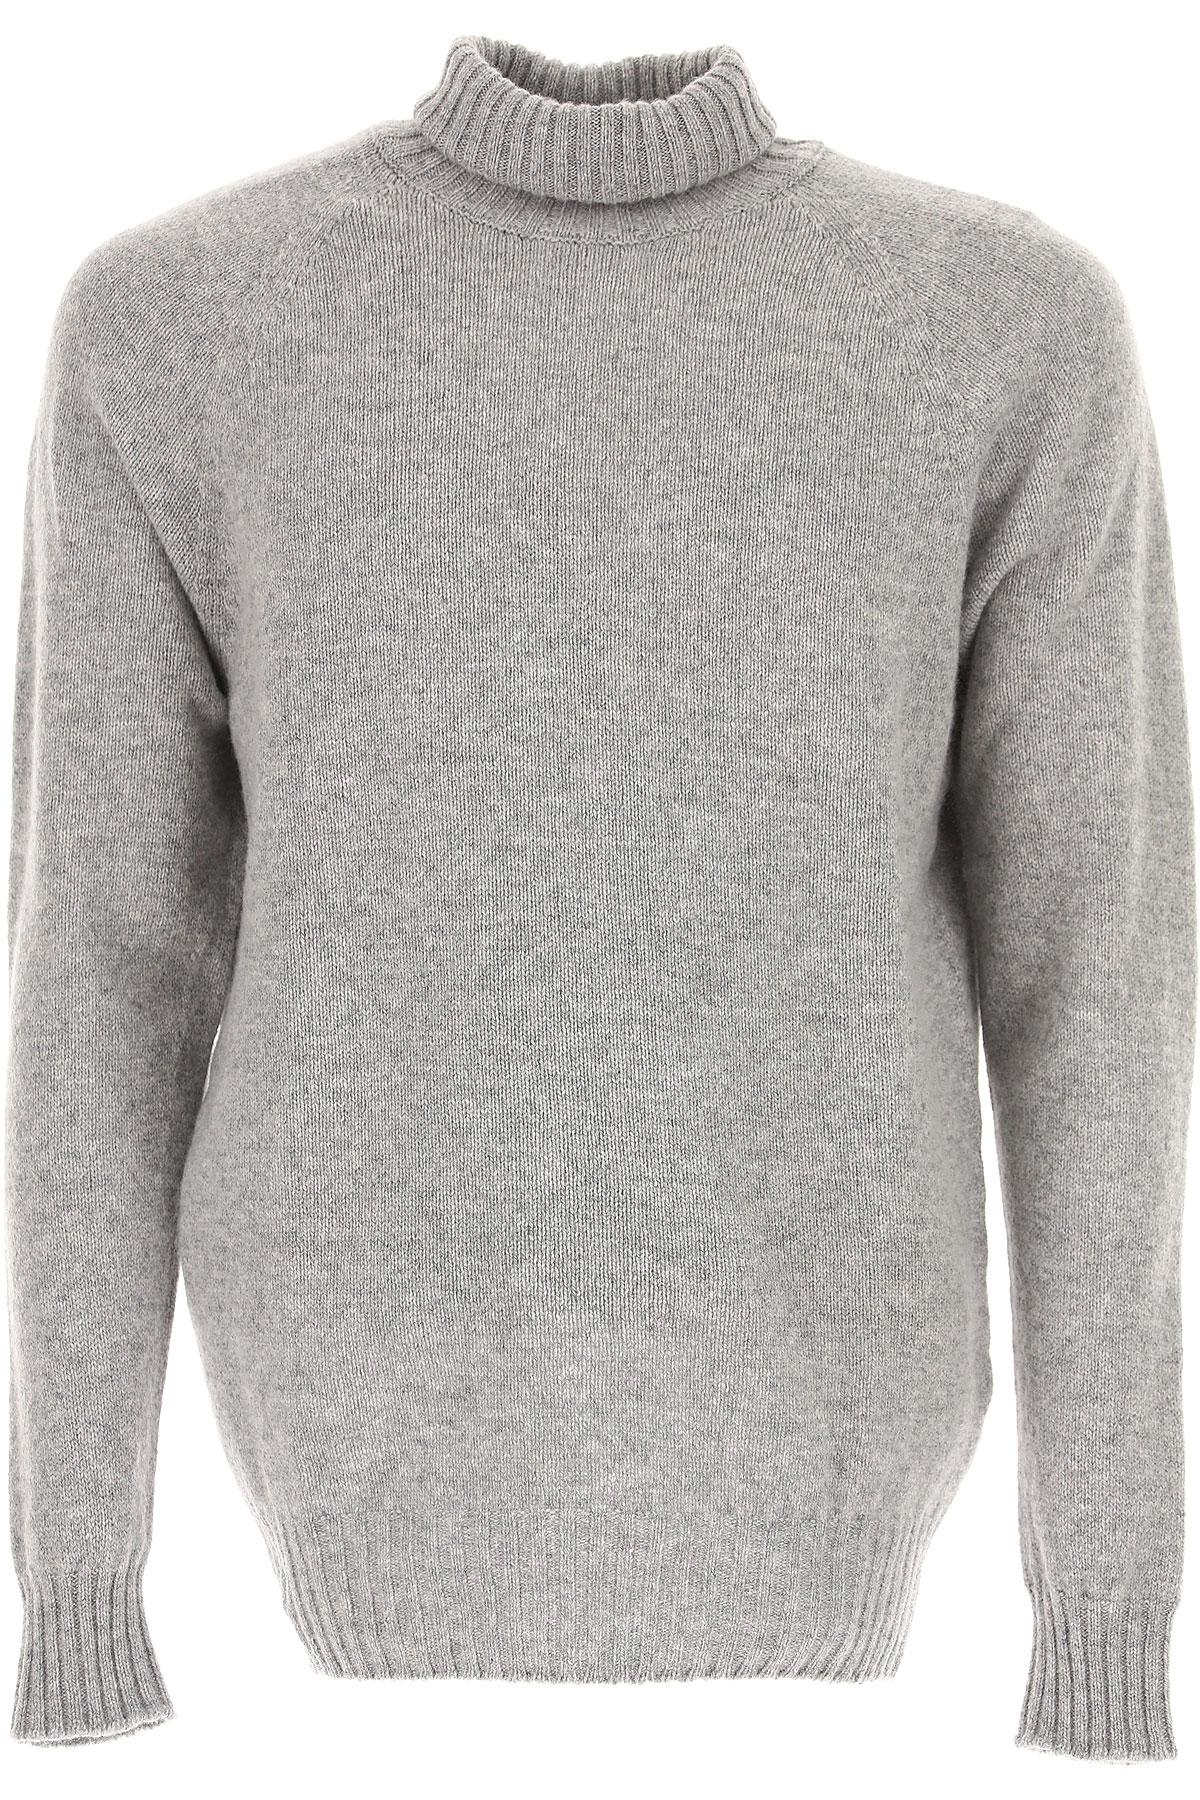 a59f45c0fdfefe Lyst - Drumohr Sweater For Men Jumper in Gray for Men